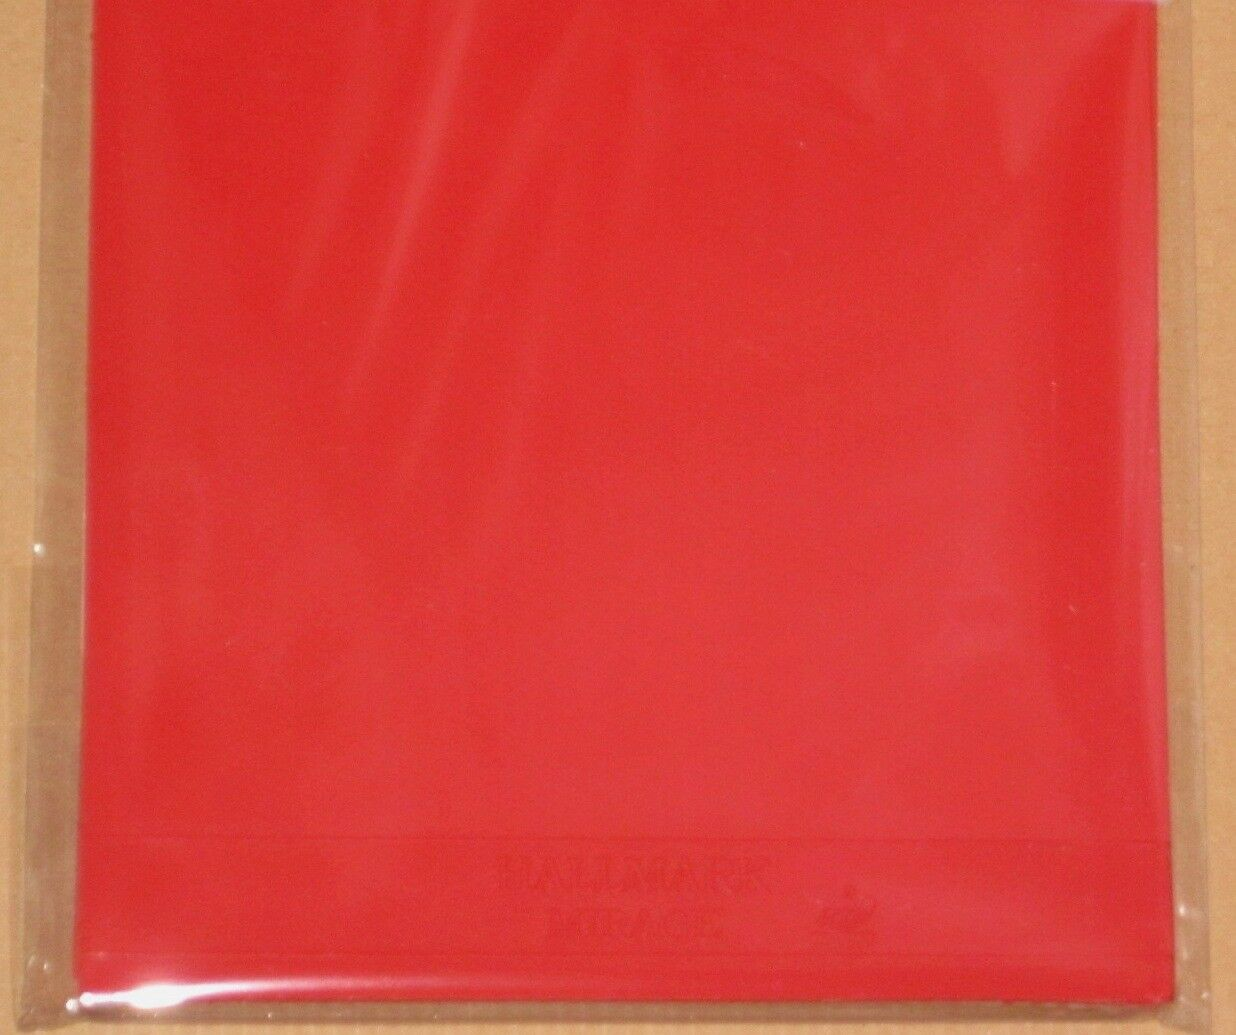 NEU Hallmark Mirage 2,0 2,0 2,0 mm rot Antitop Anti Spin rubber Antispin Tischtennis top b3fd8a